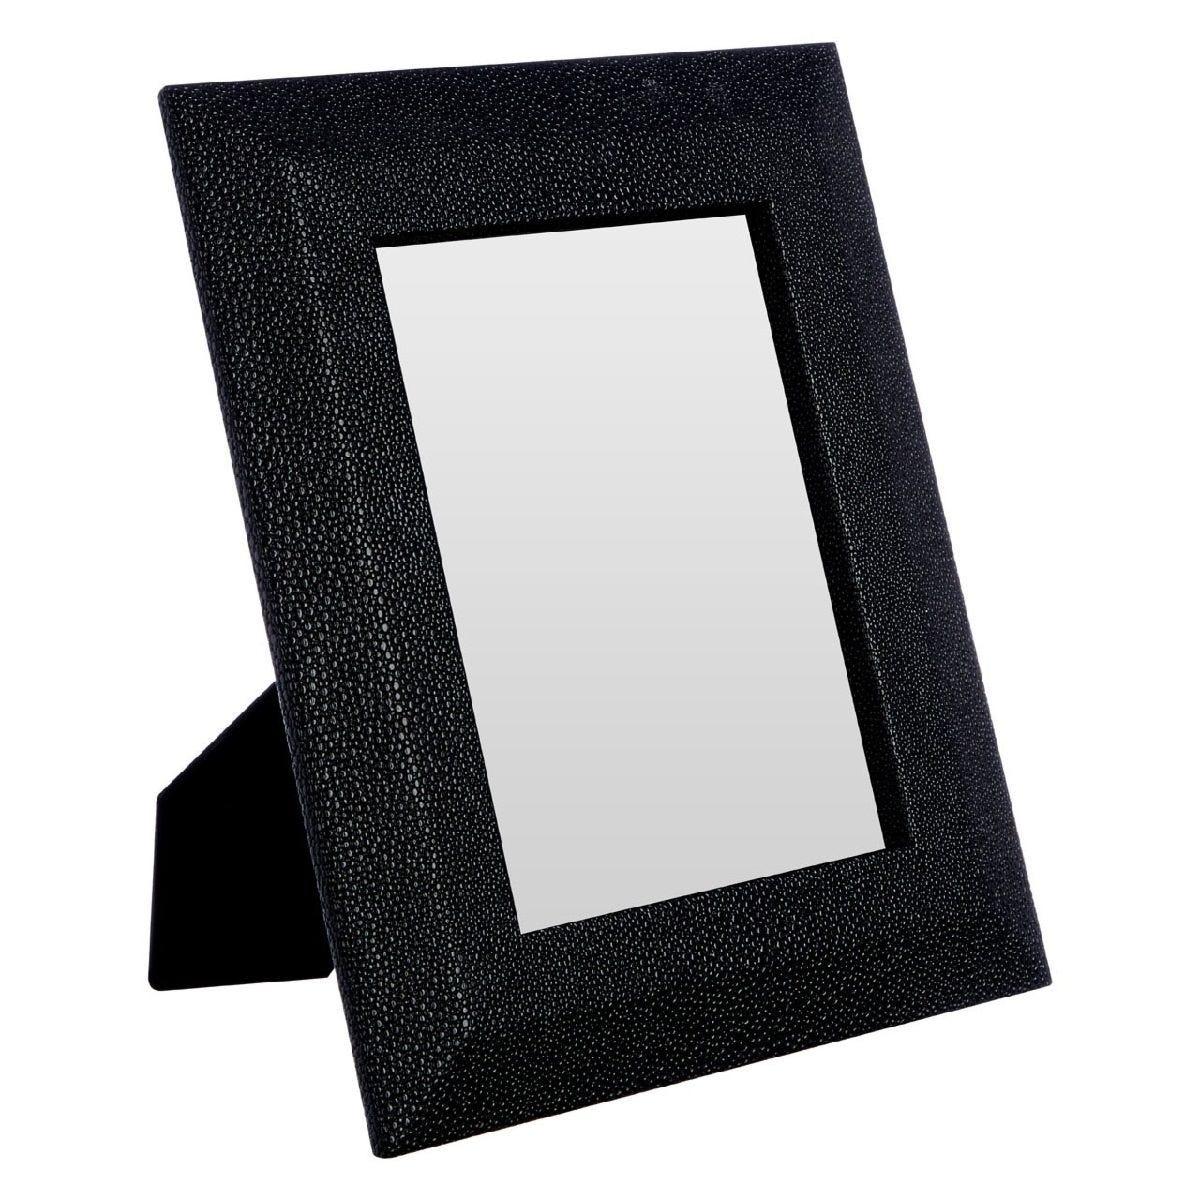 Premier Housewares Pacific Photo Frame Black Faux Shark Skin 6in x 8in